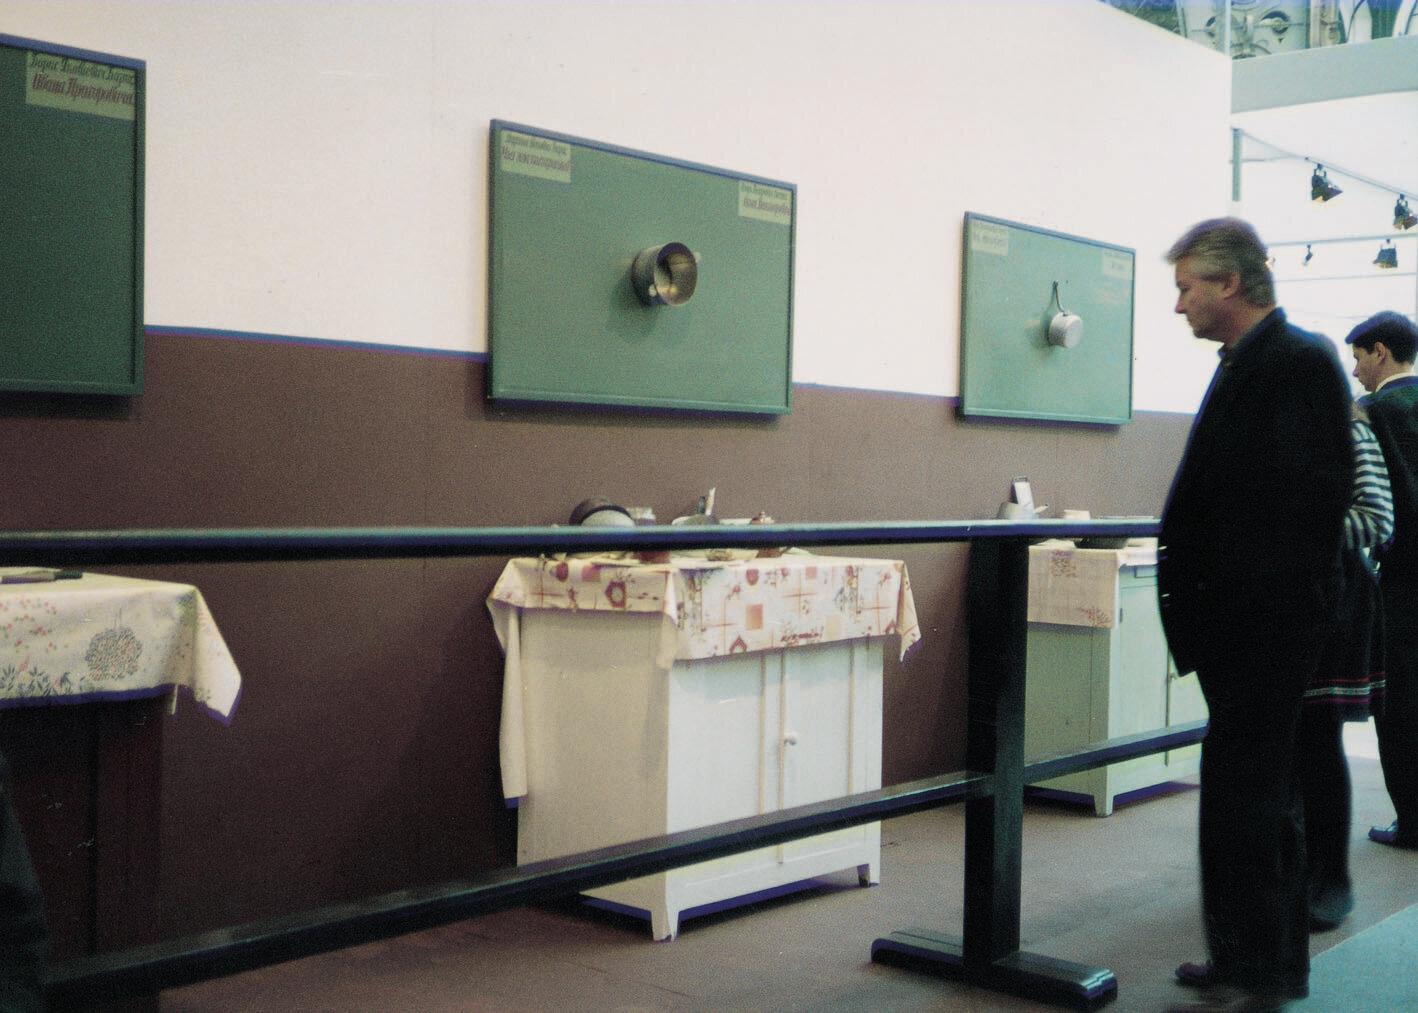 View-of-installation-Fiac-Paris-Galerie-Dina-Vierny-1991-Photo-by-Jean-Alex-Brunnel.jpg